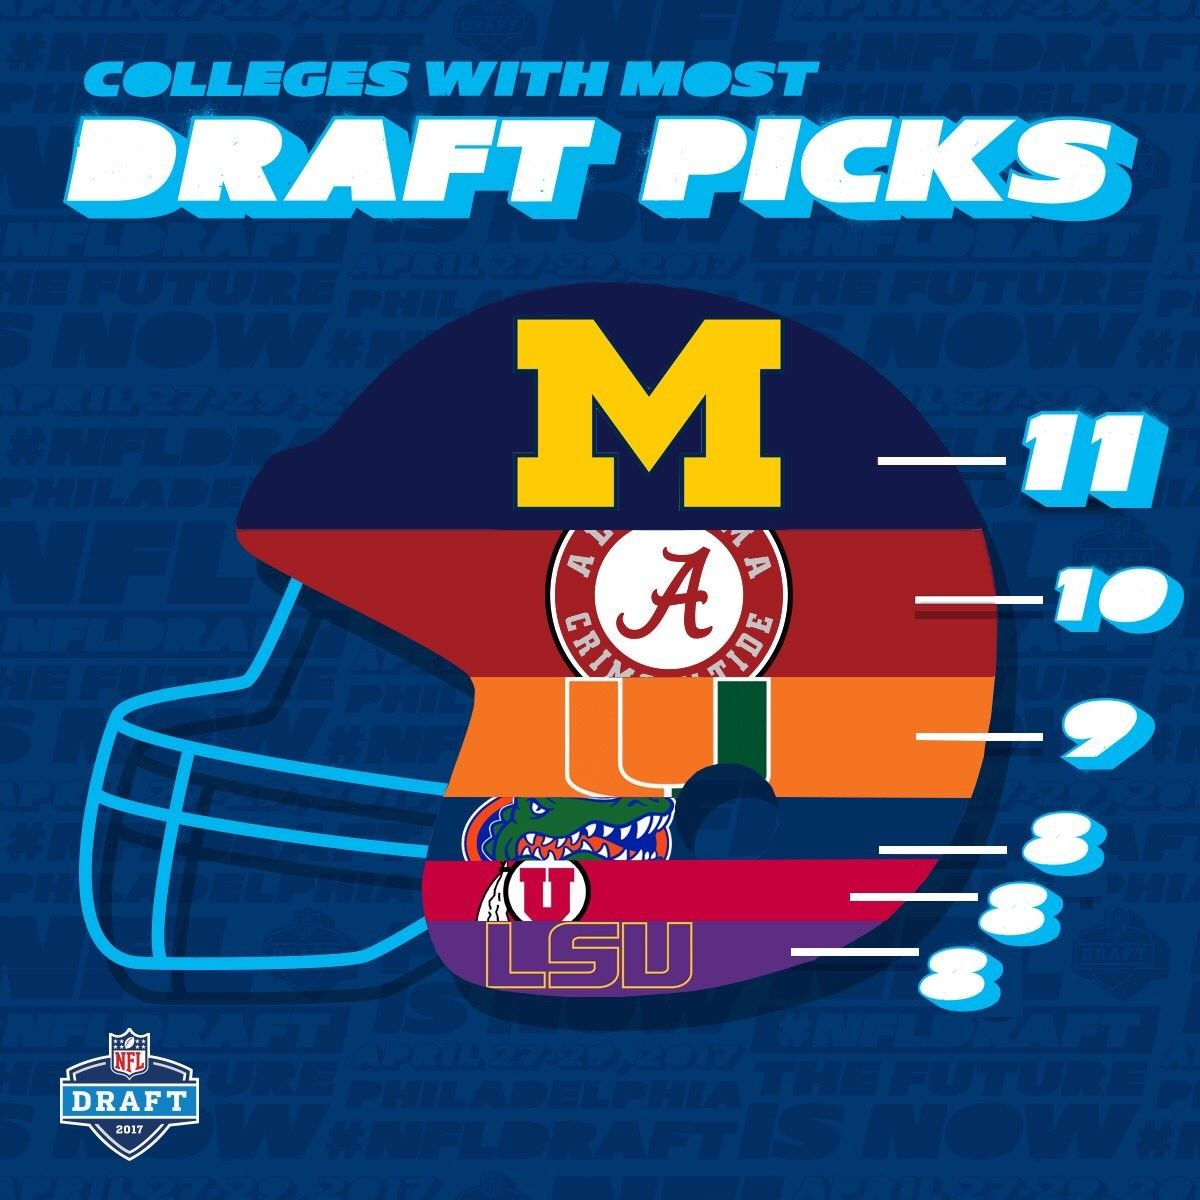 2017 draft michigan football college athletics lsu